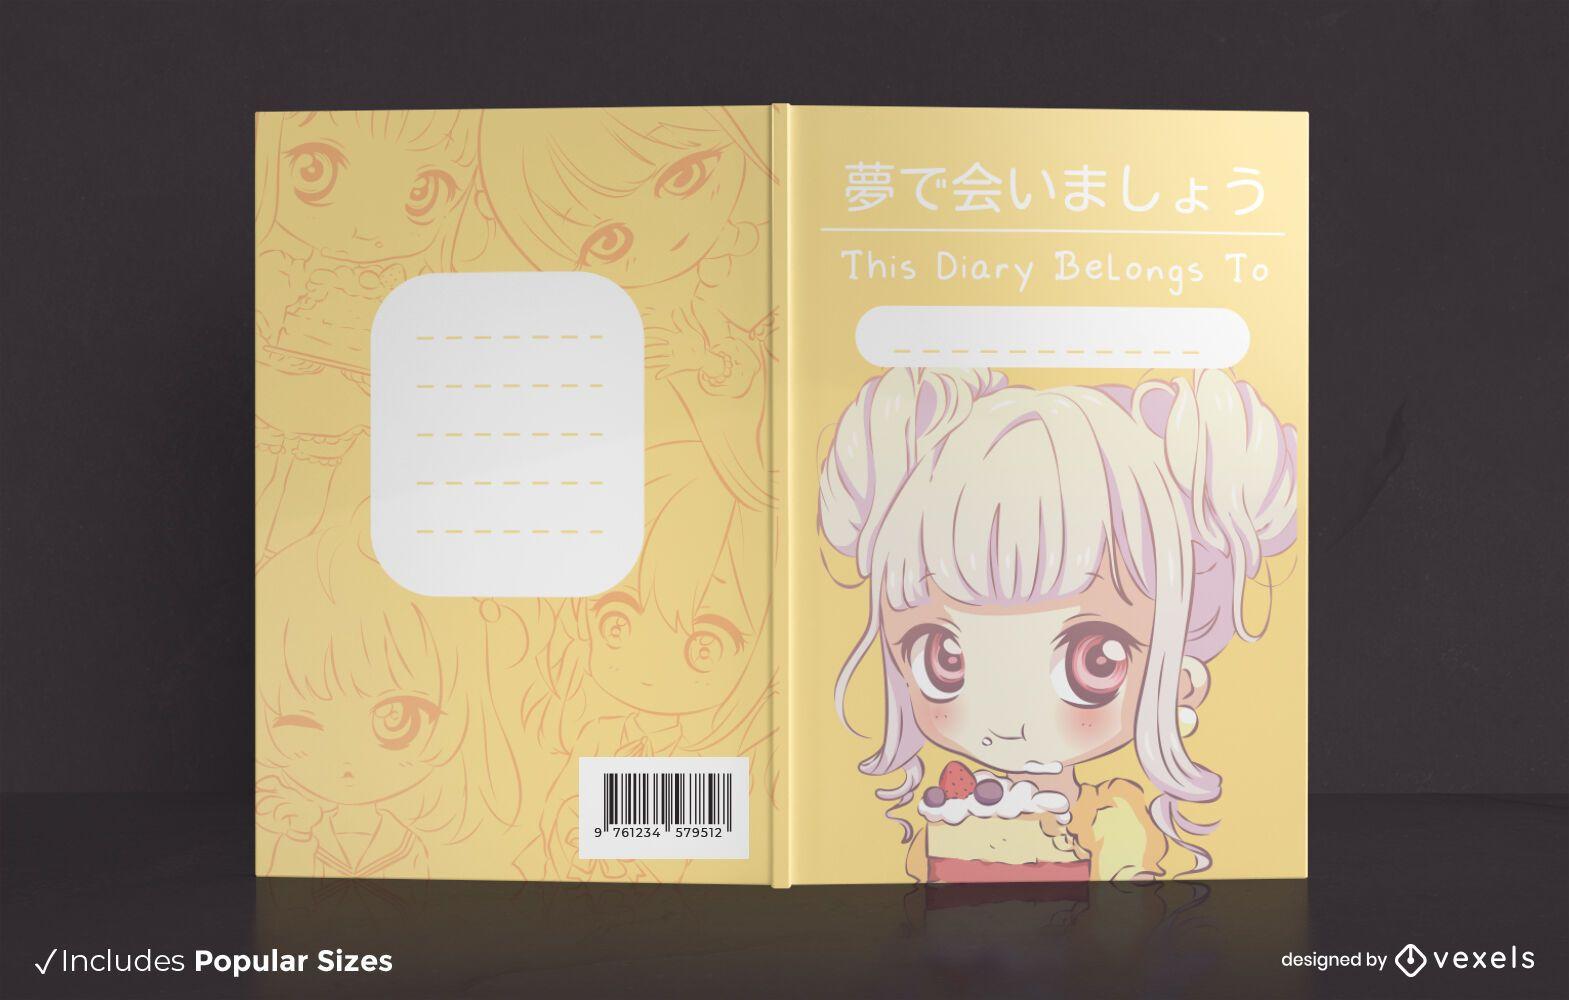 Anime girl chibi book cover design